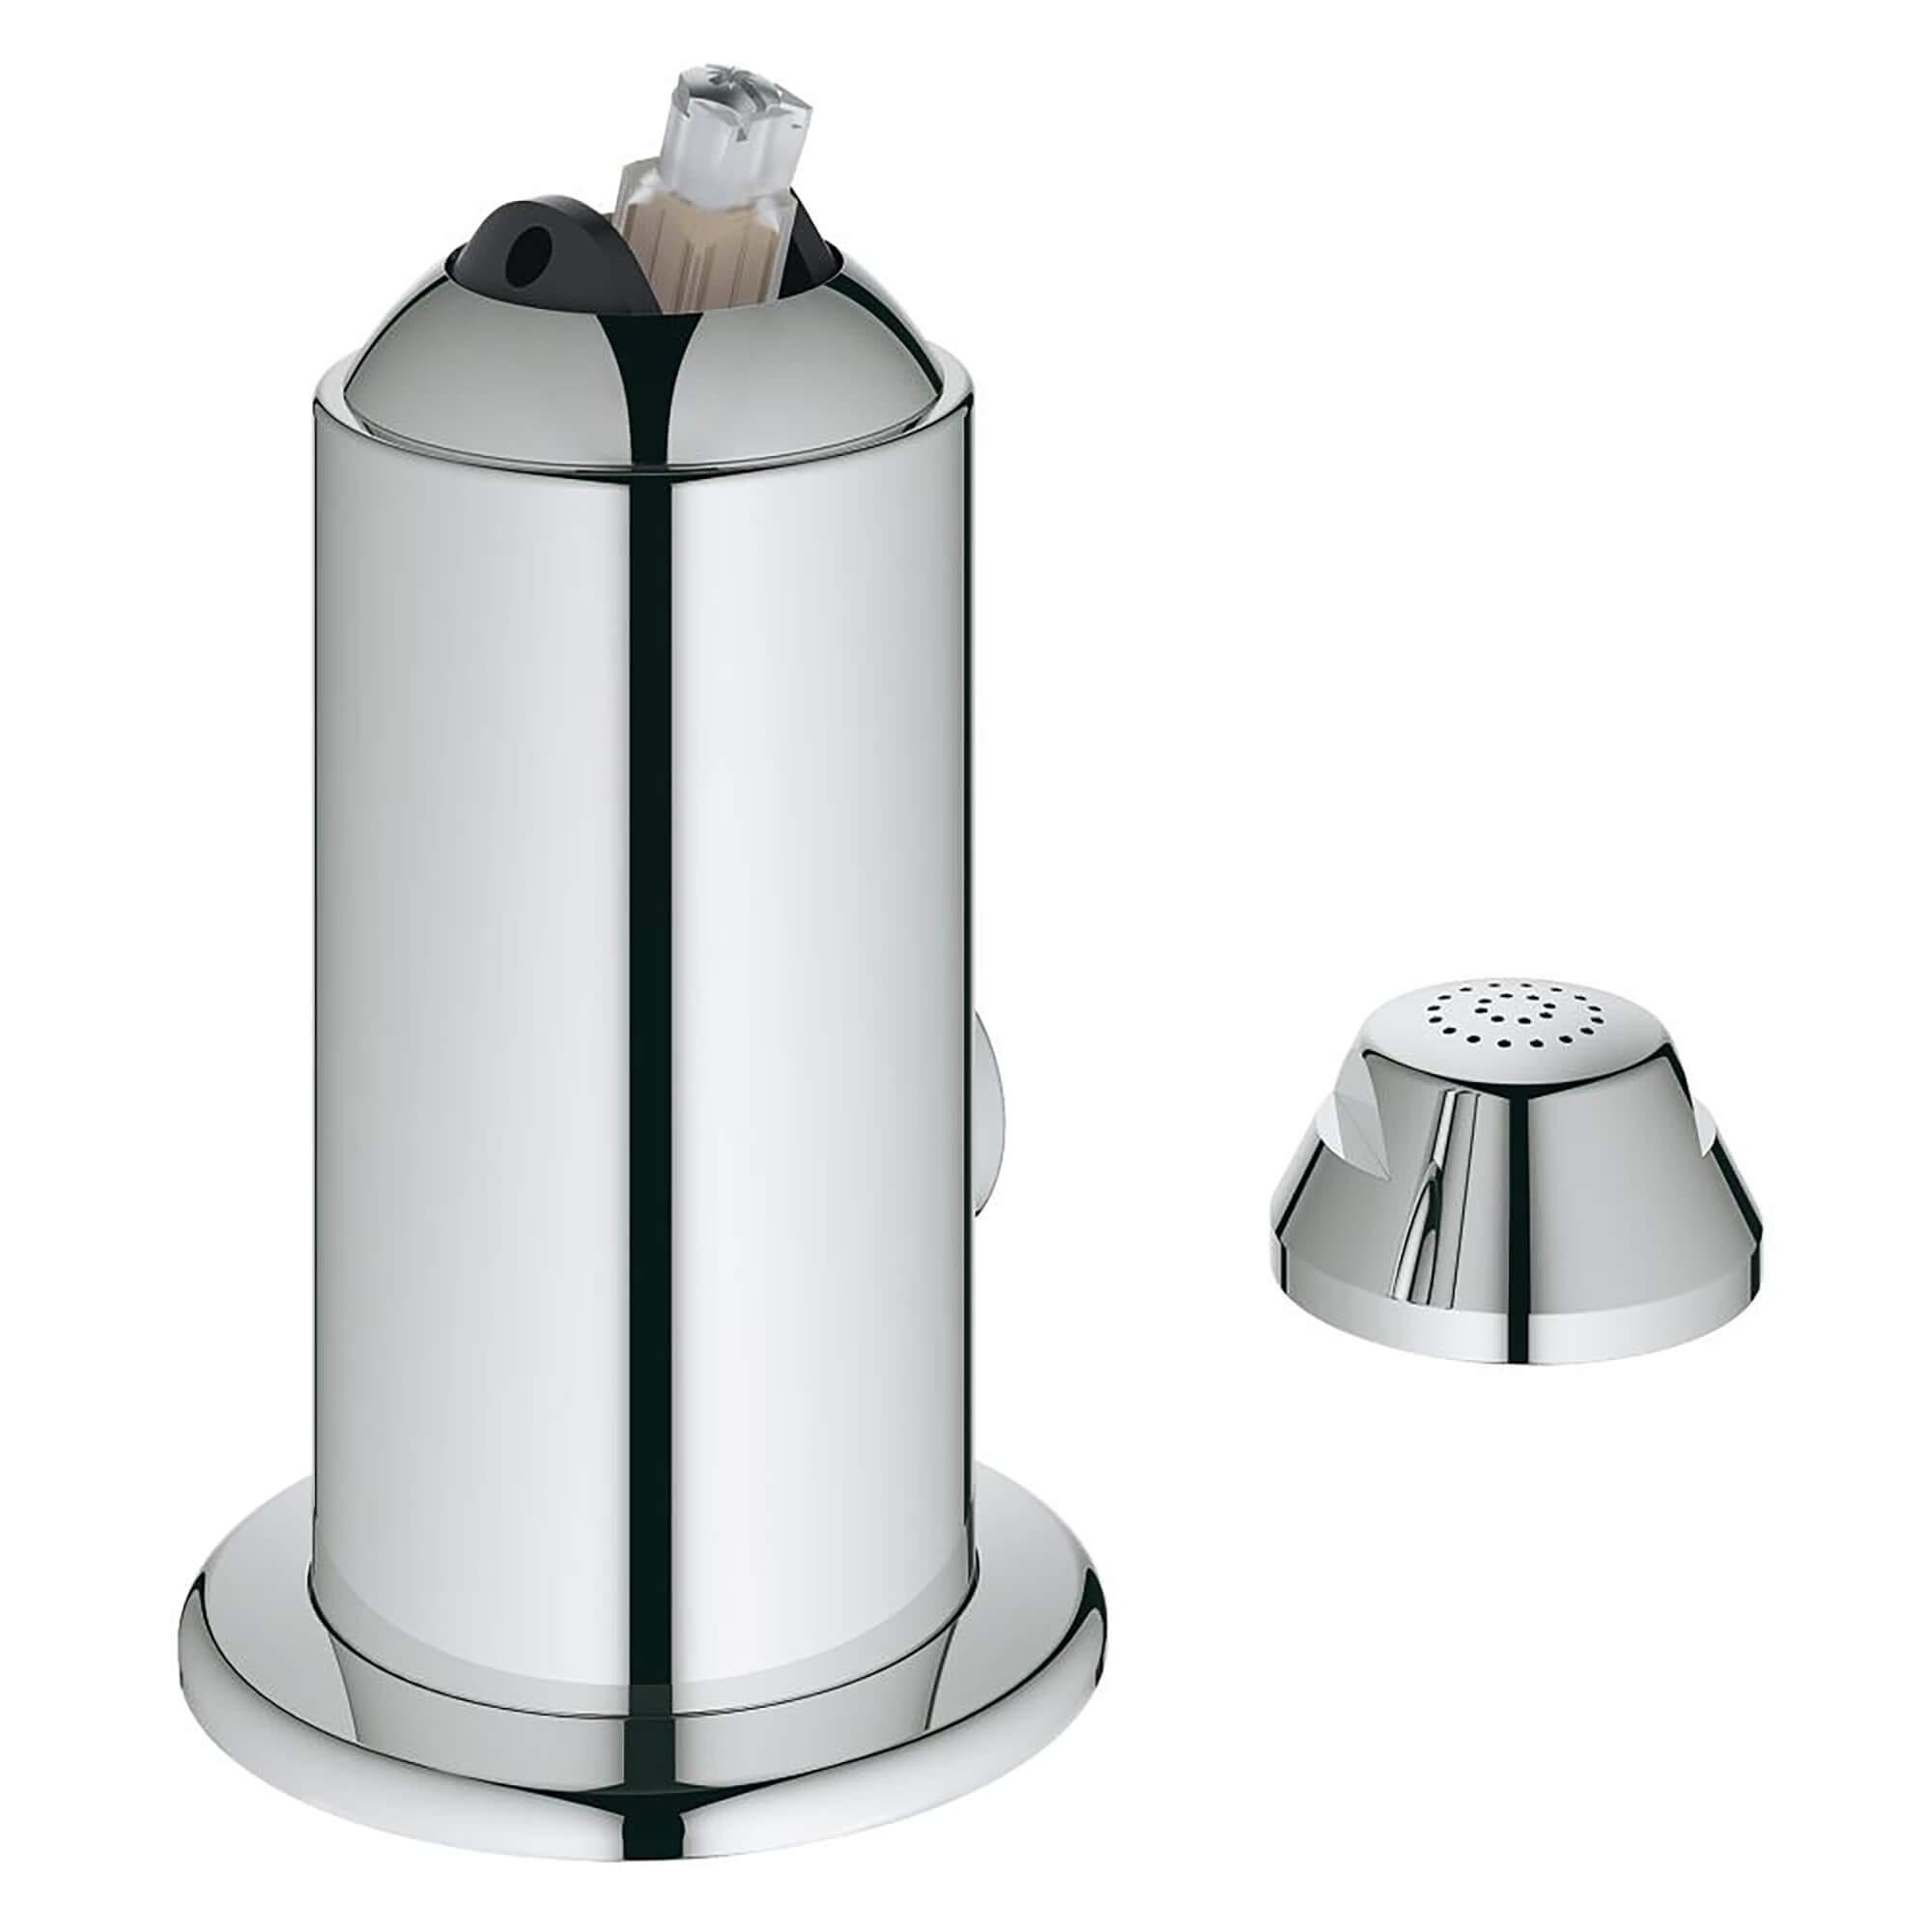 Grohe 23304000 1-Handle Bidet Faucet